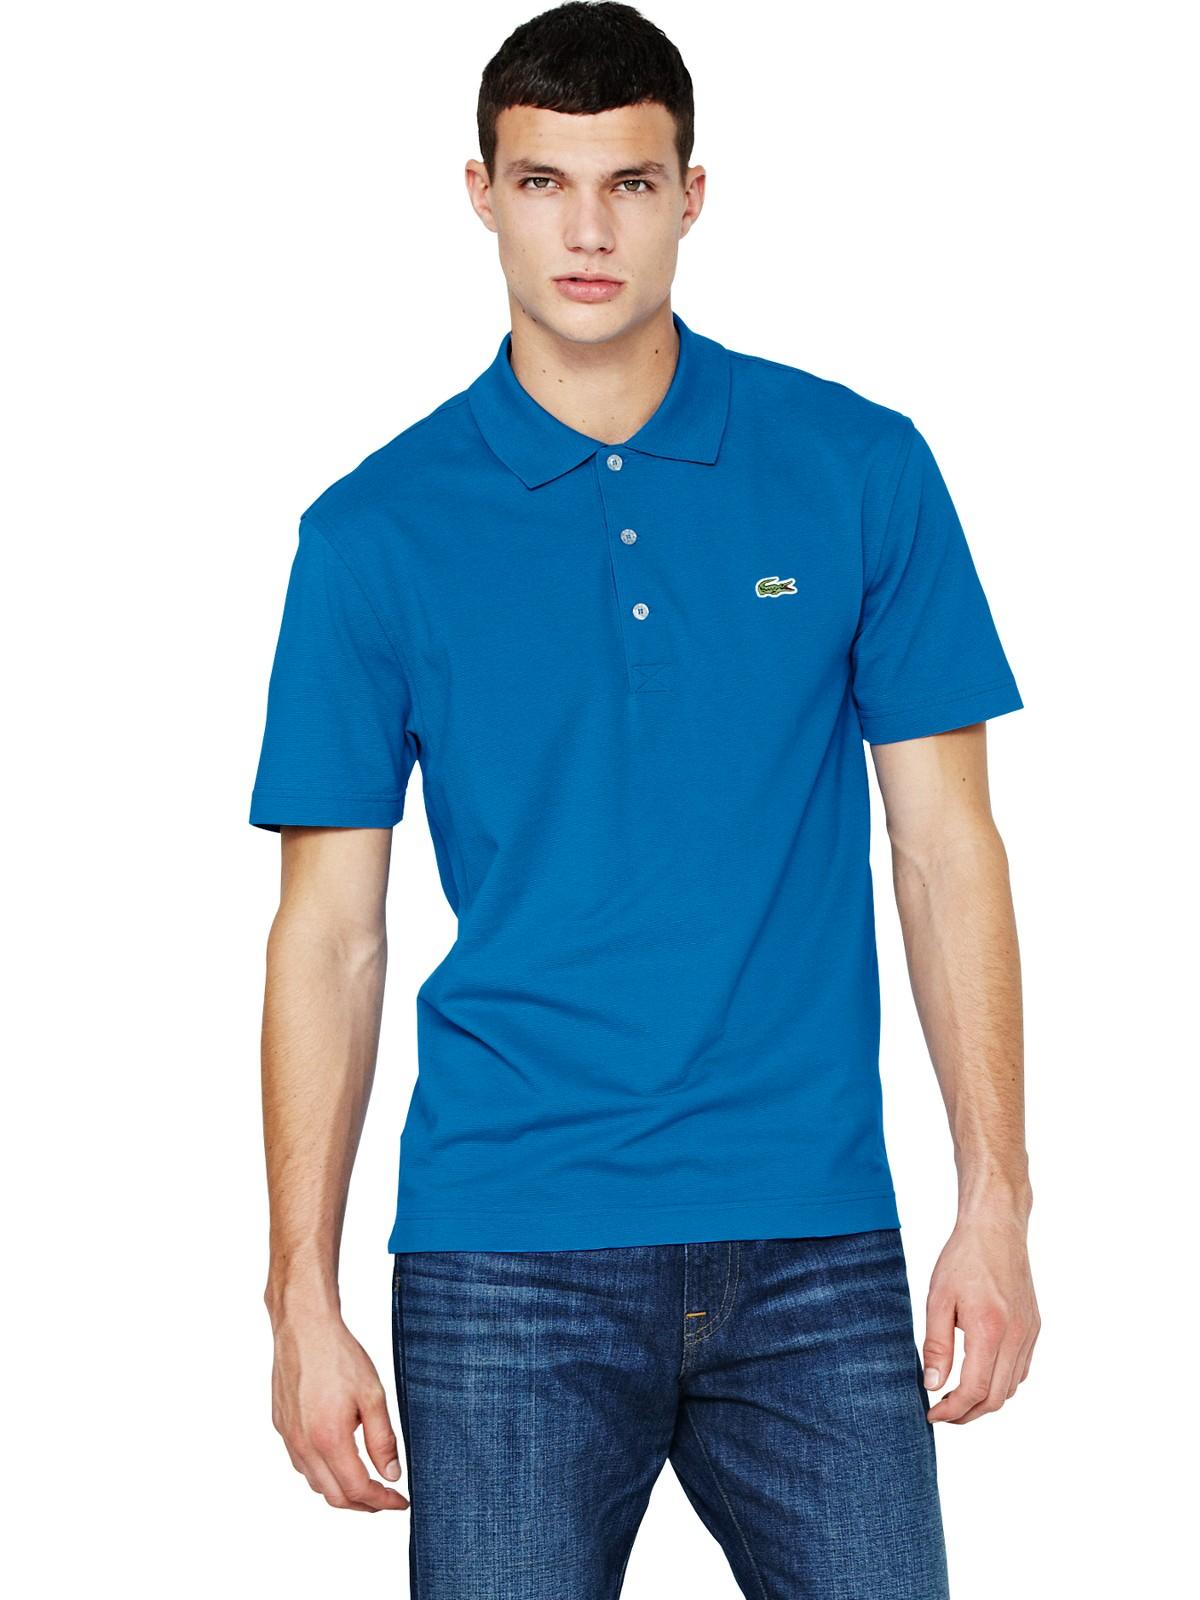 Lacoste lacoste mens short sleeve polo shirt blue in blue for Short sleeve lacoste shirt